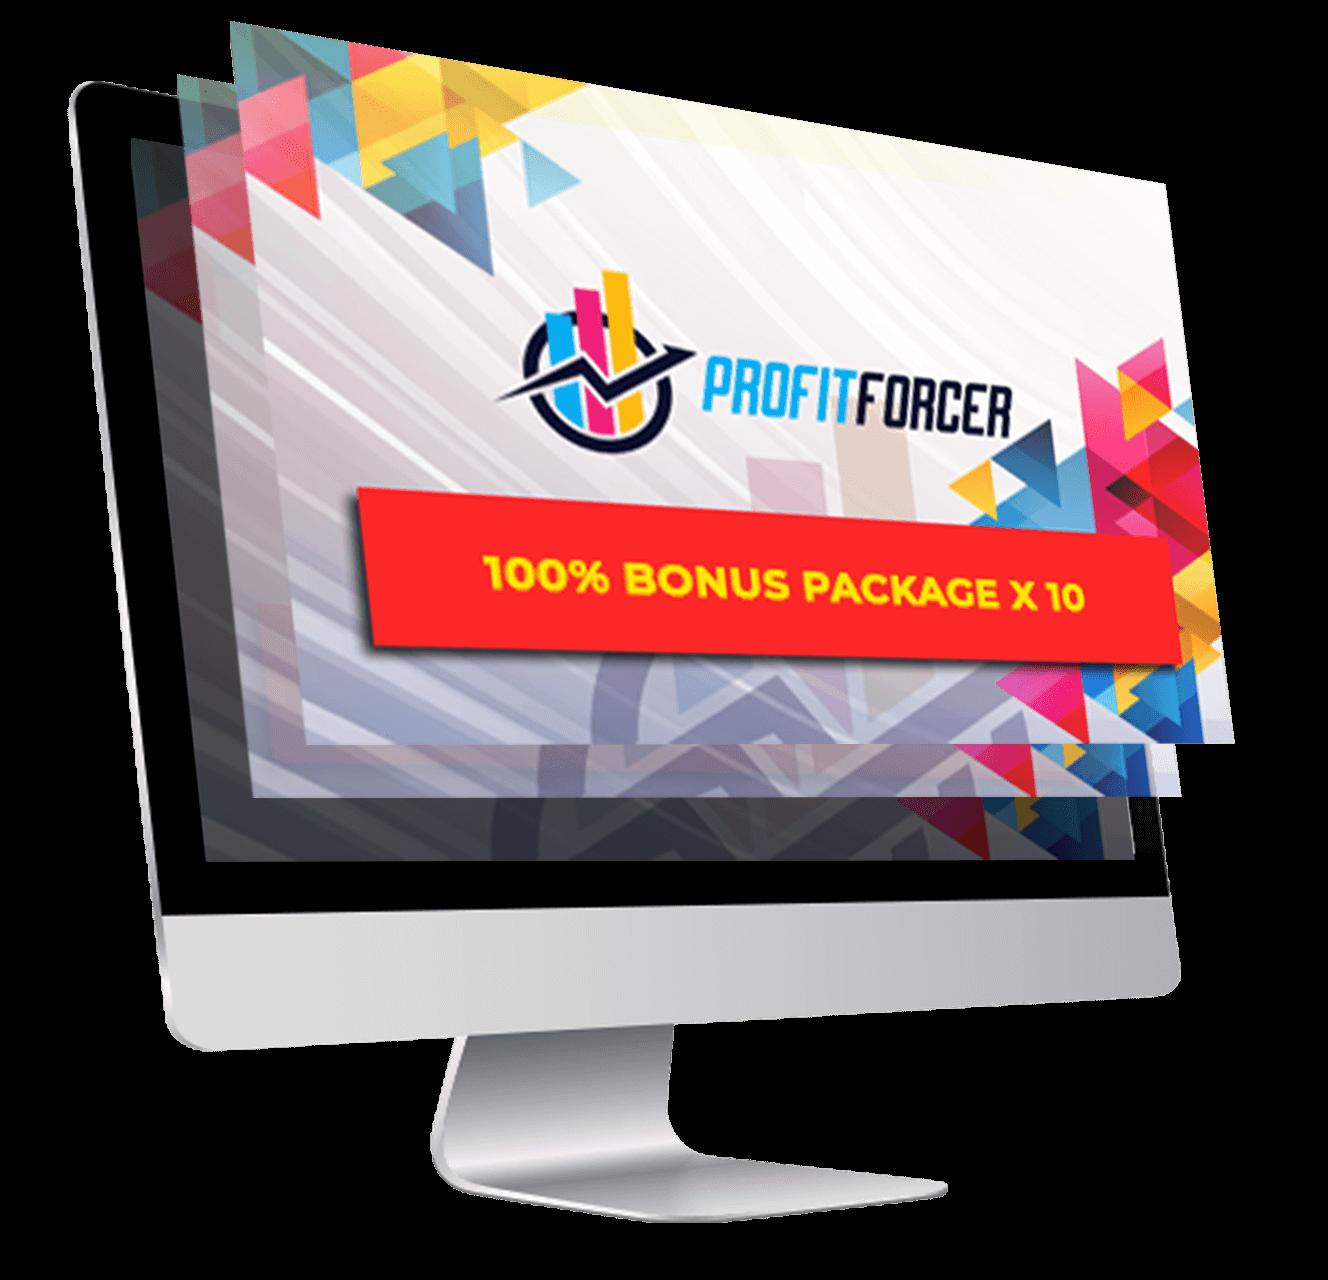 Profit-Forcer-Feature-3